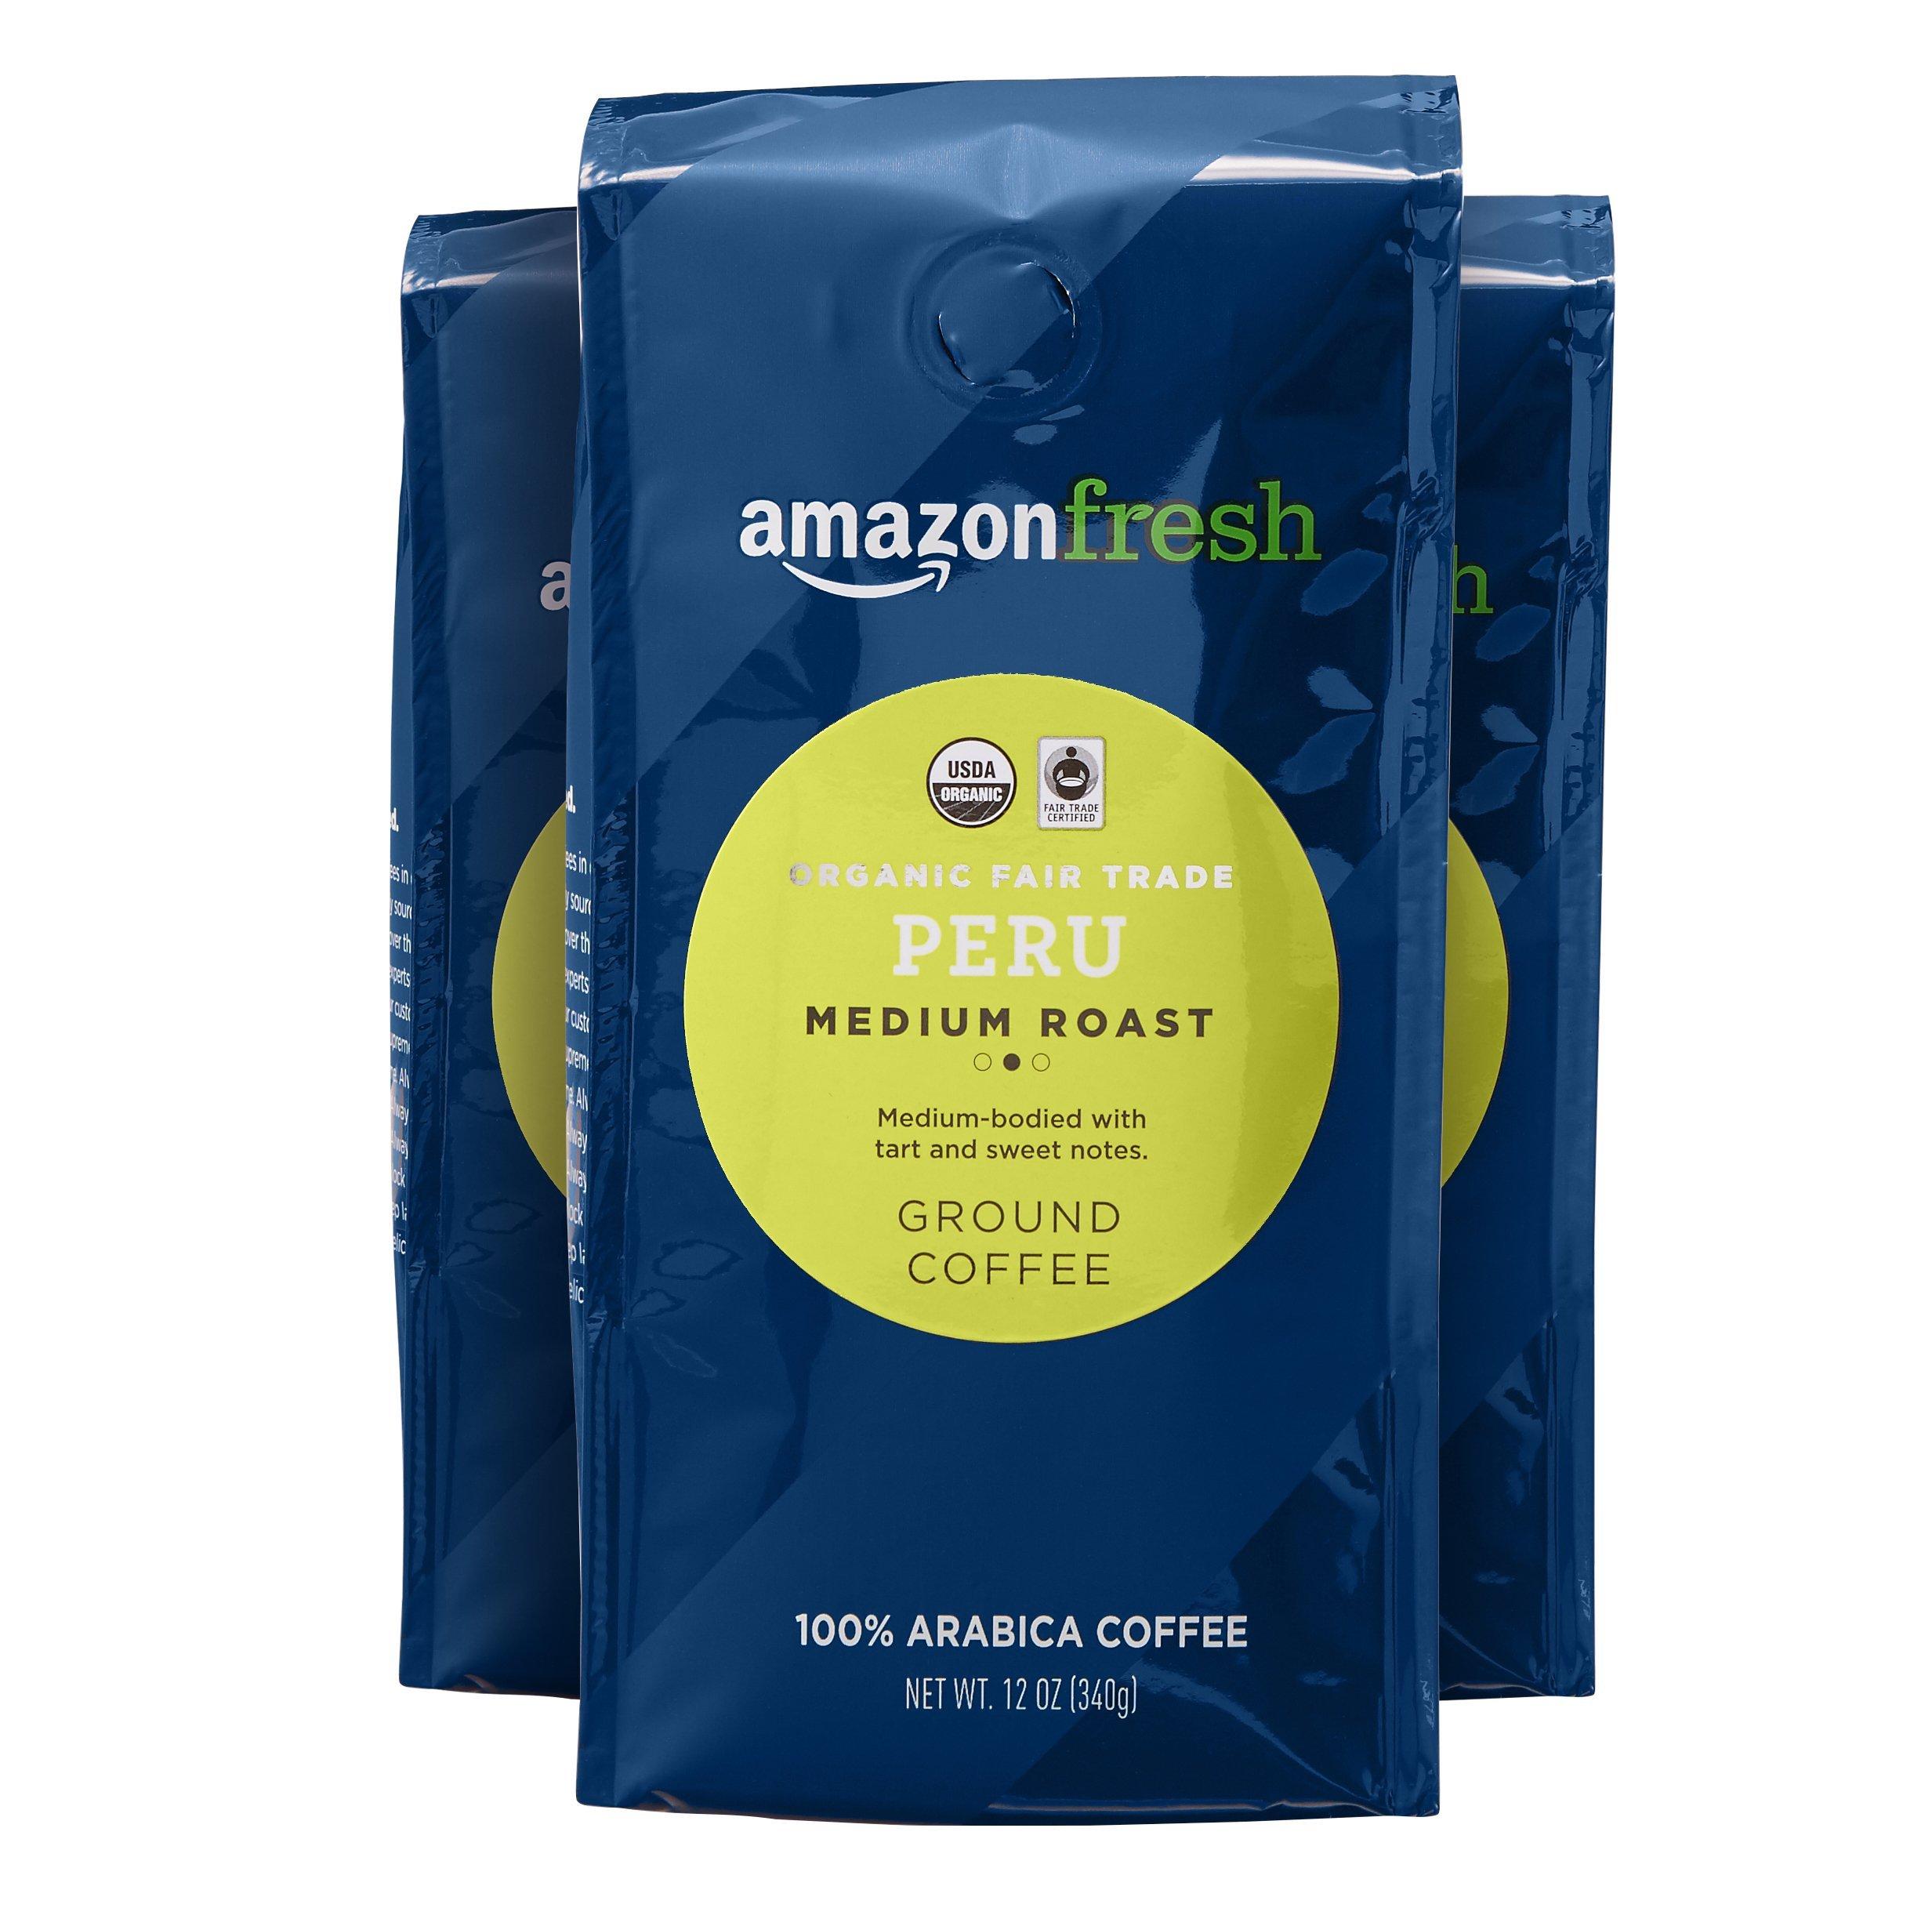 AmazonFresh Organic Fair Trade Peru Ground Coffee, Medium Roast, 12 Ounce (Pack of 3)